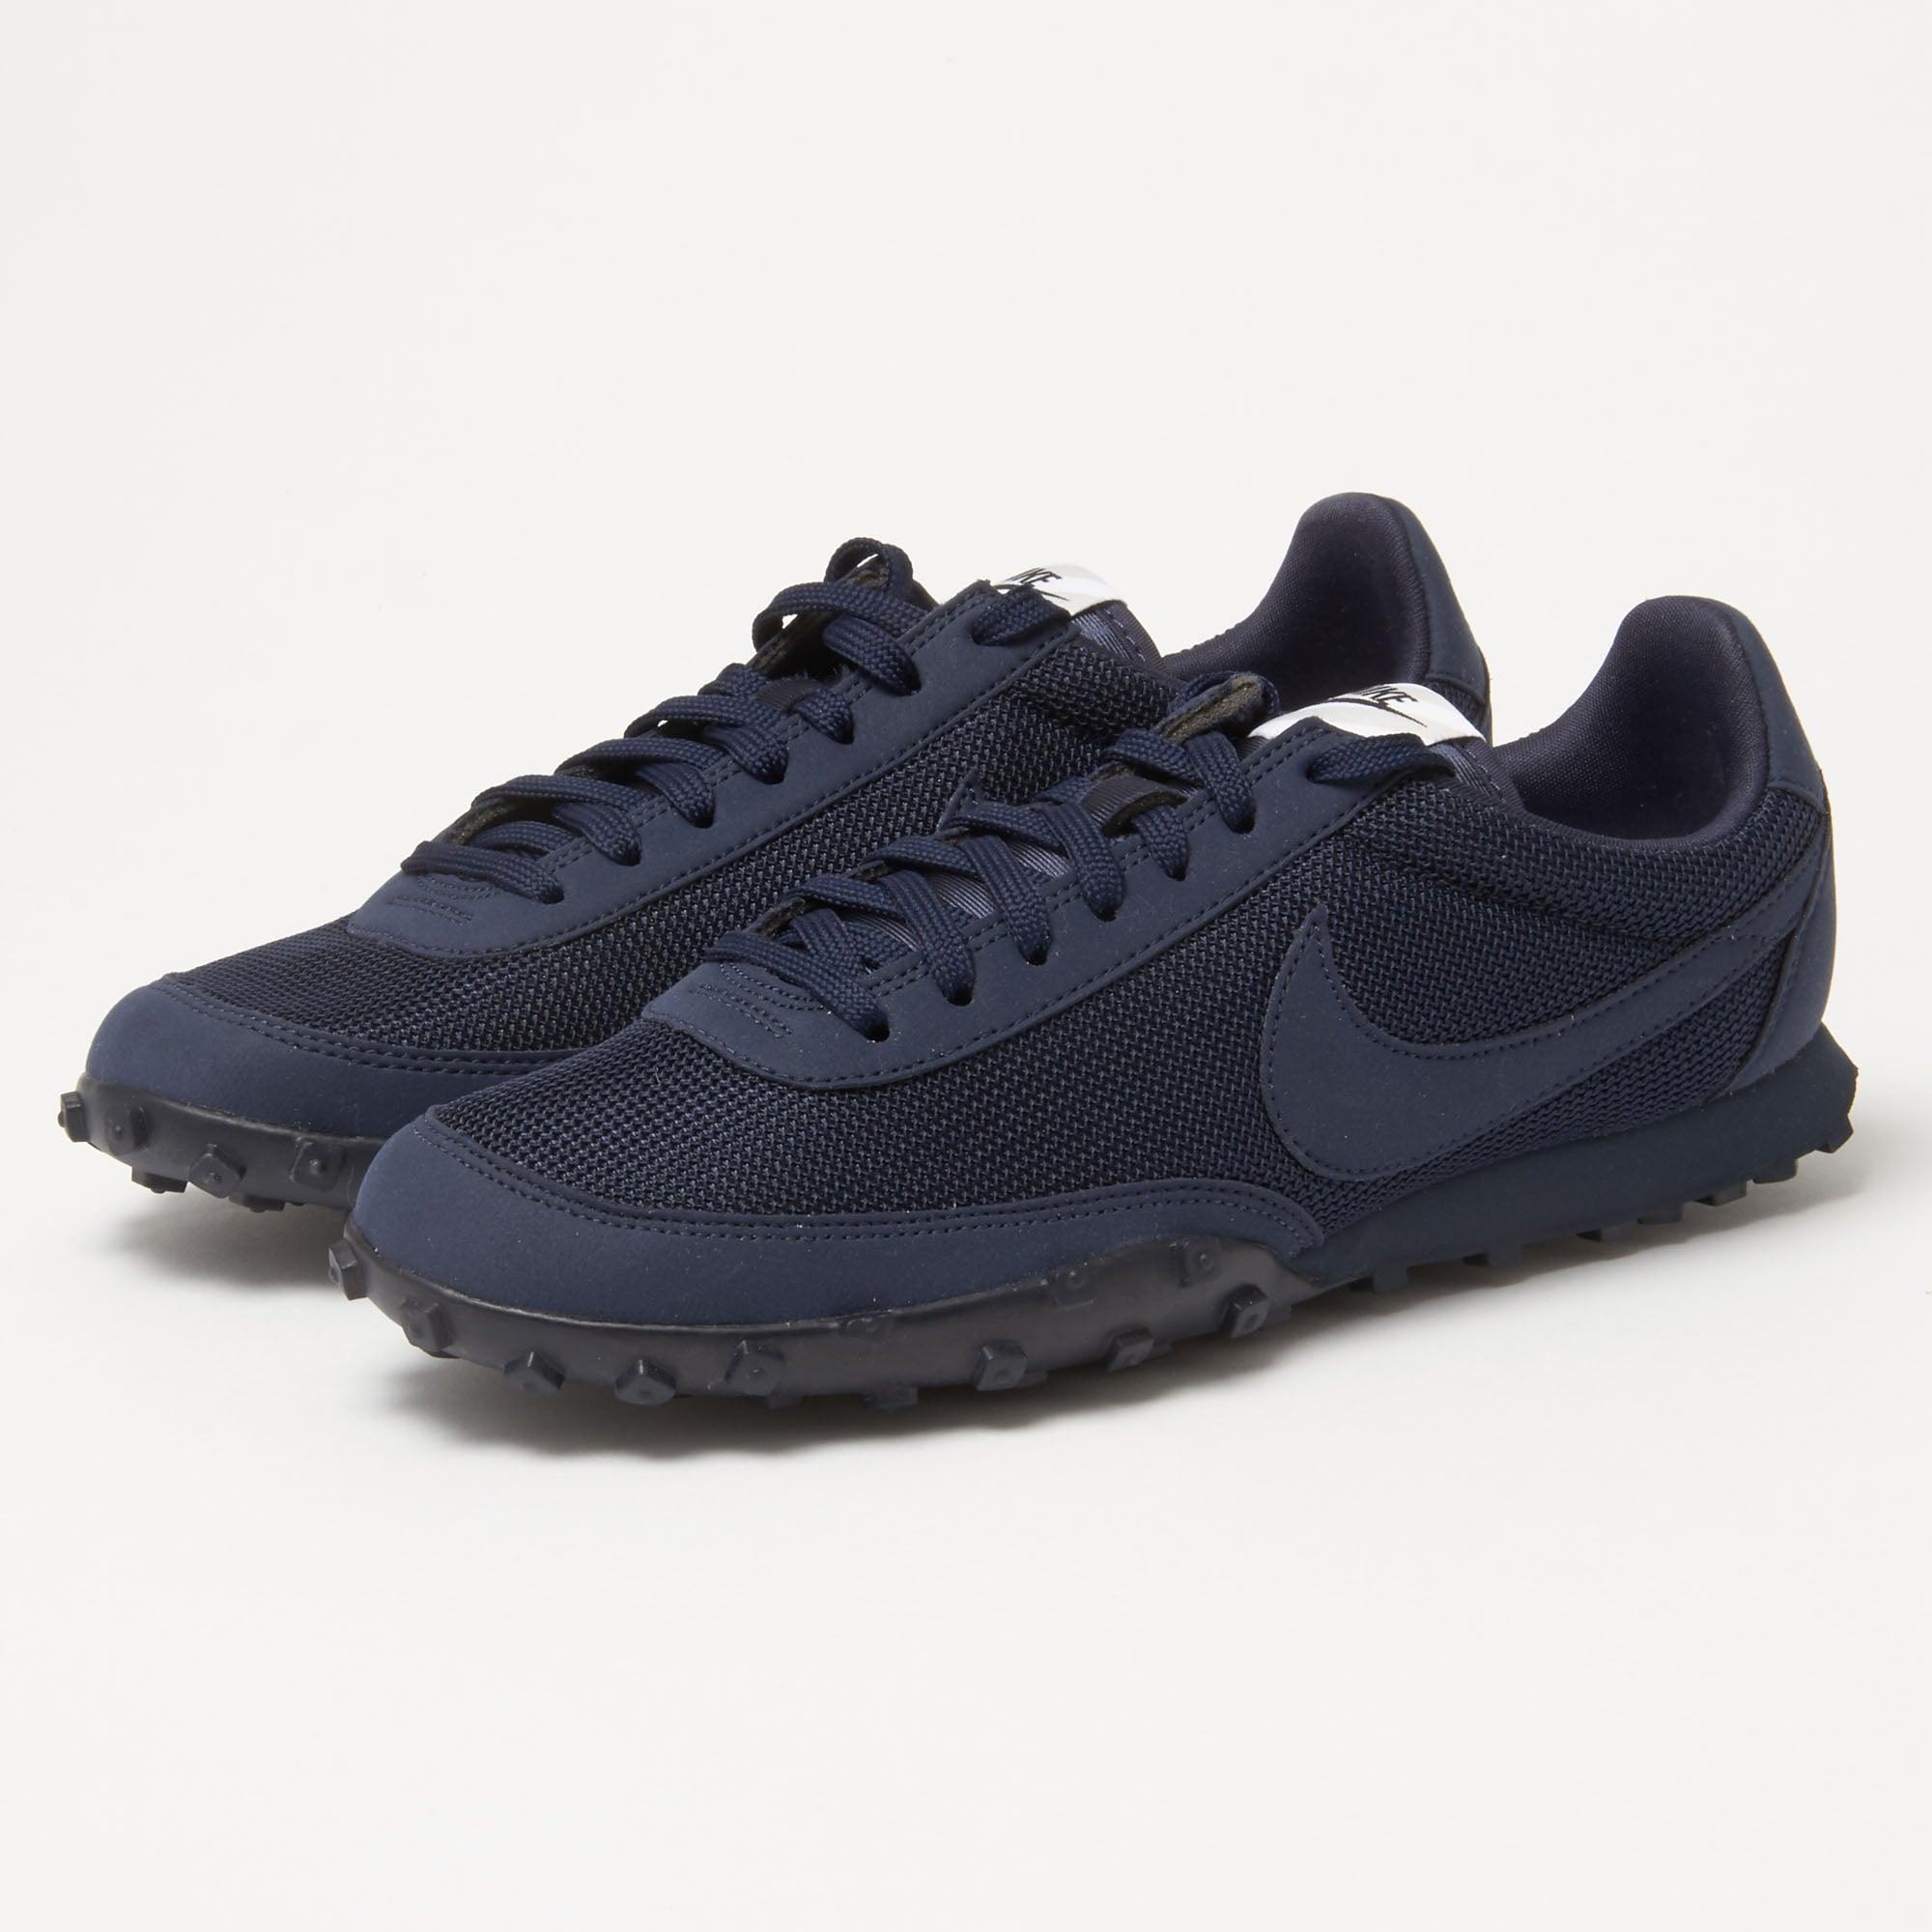 lyst nike waffle racer 39 17 prm obsidian sneaker in blue. Black Bedroom Furniture Sets. Home Design Ideas